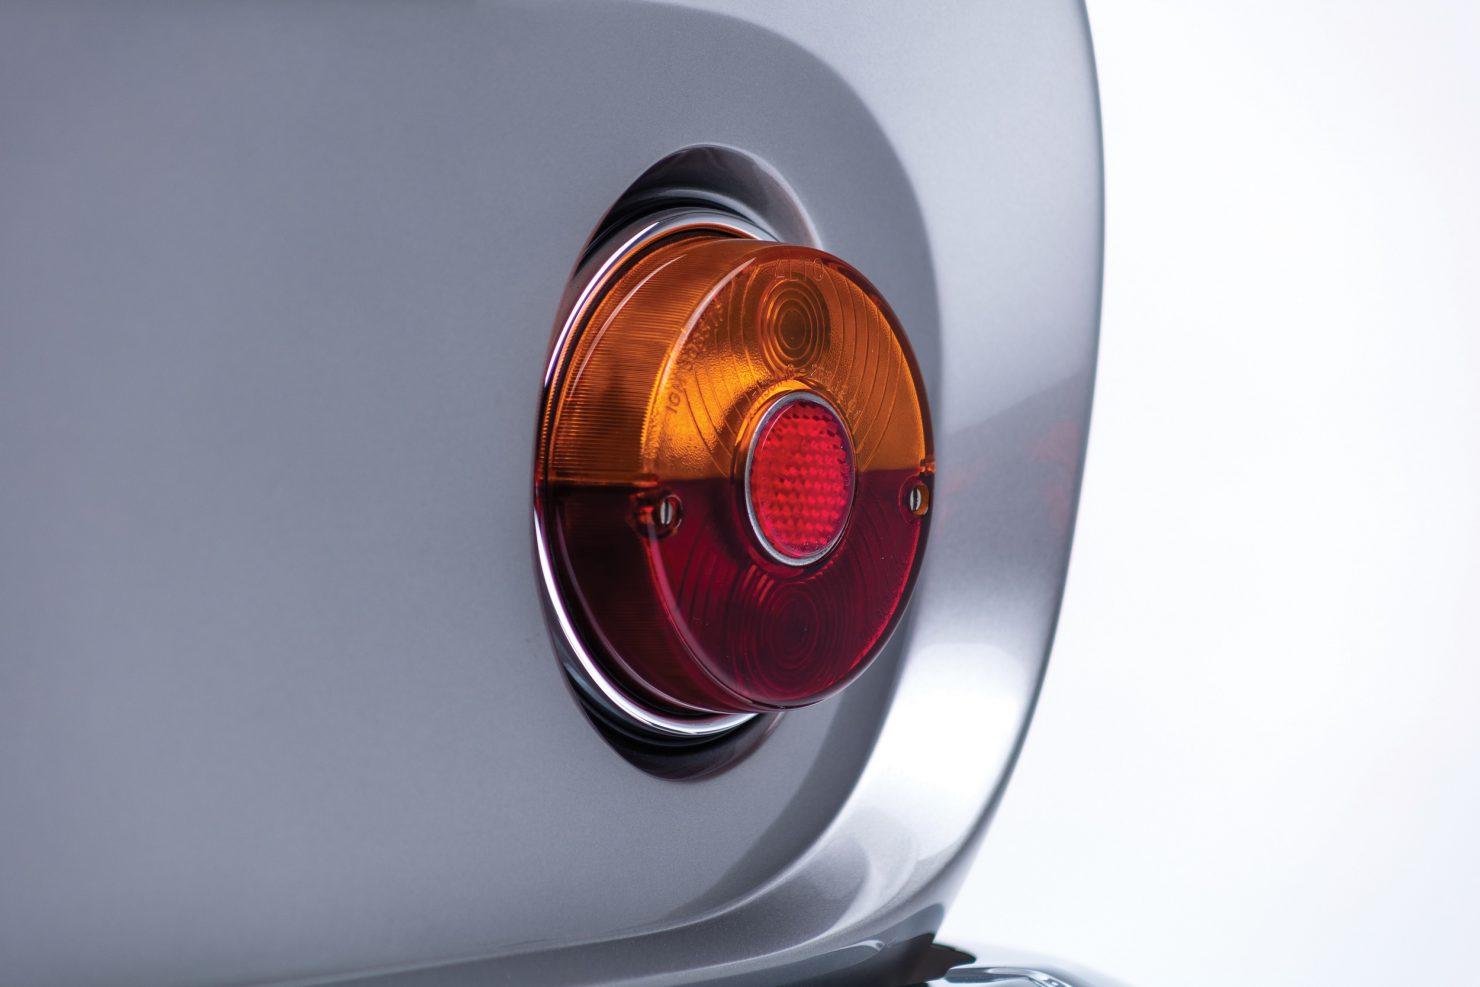 ferrari 275 gtb car 15 1480x987 - 1965 Ferrari 275 GTB/6C Alloy